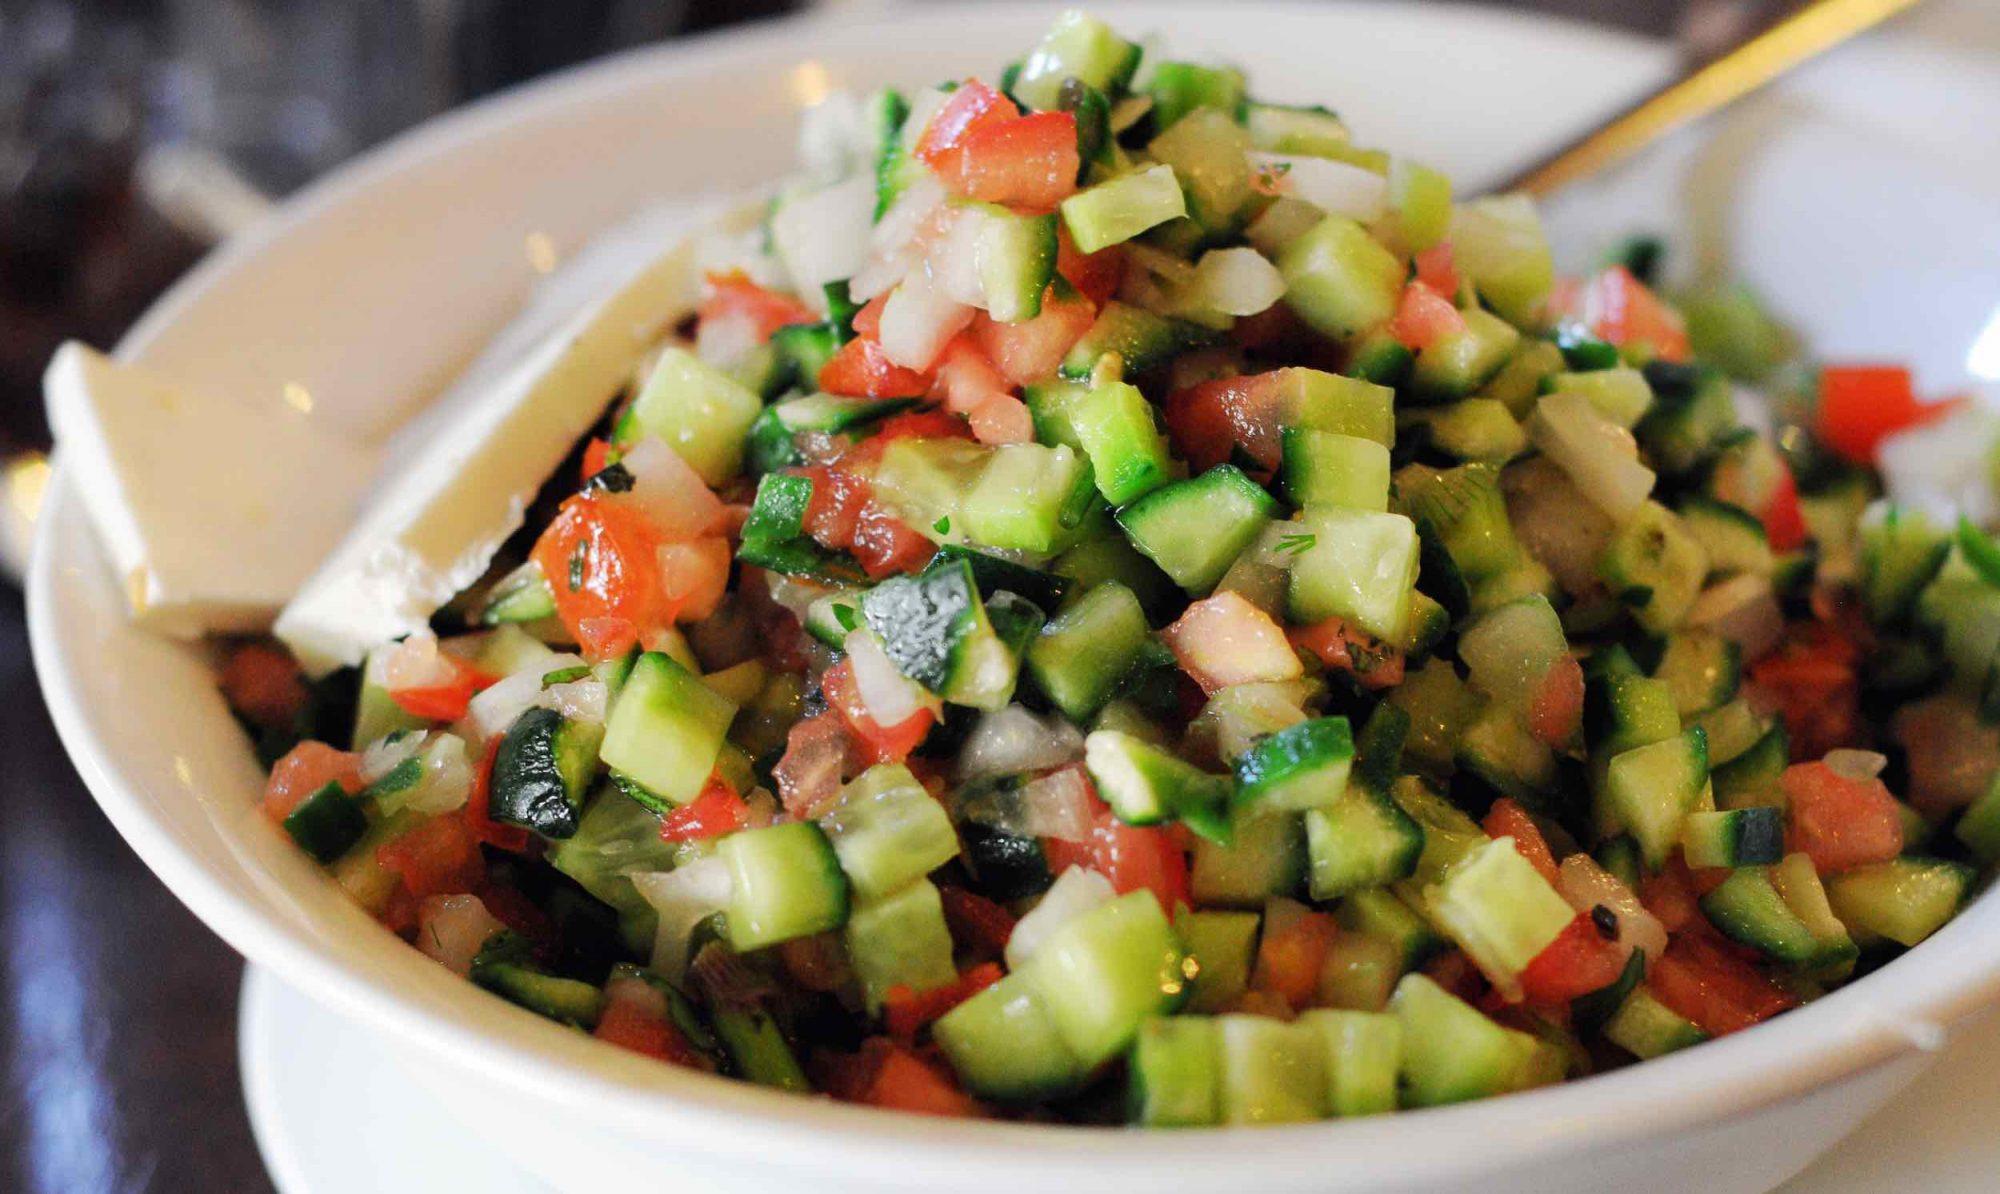 How to Make Israeli Salad